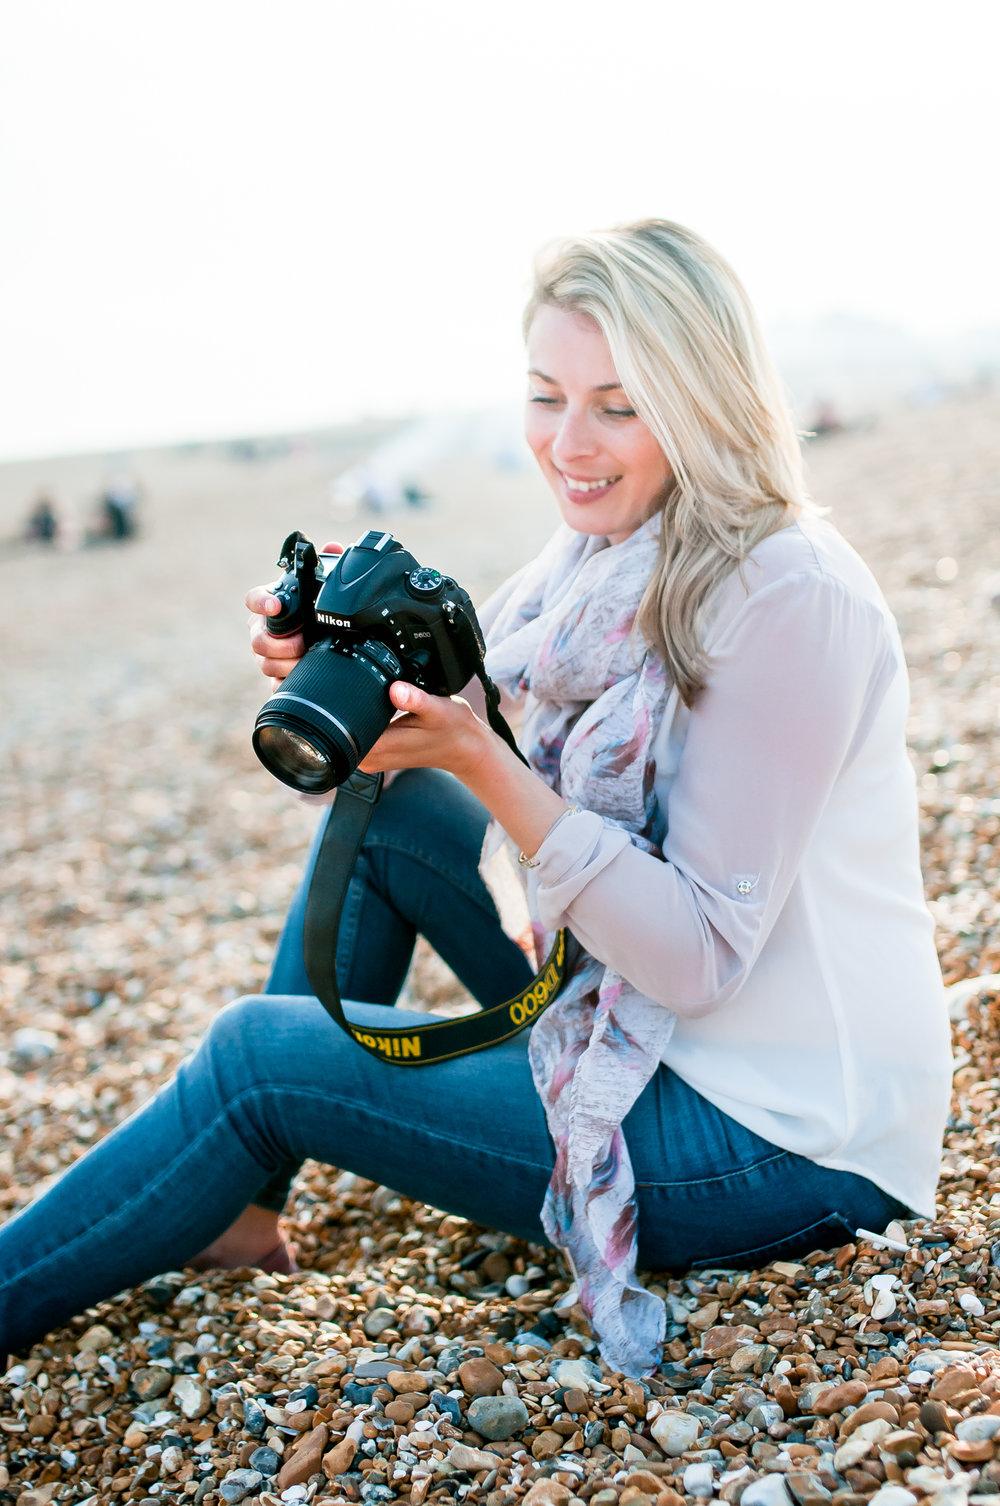 London & Brighton Portrait Photographer - Magdalena Smolarska Photography